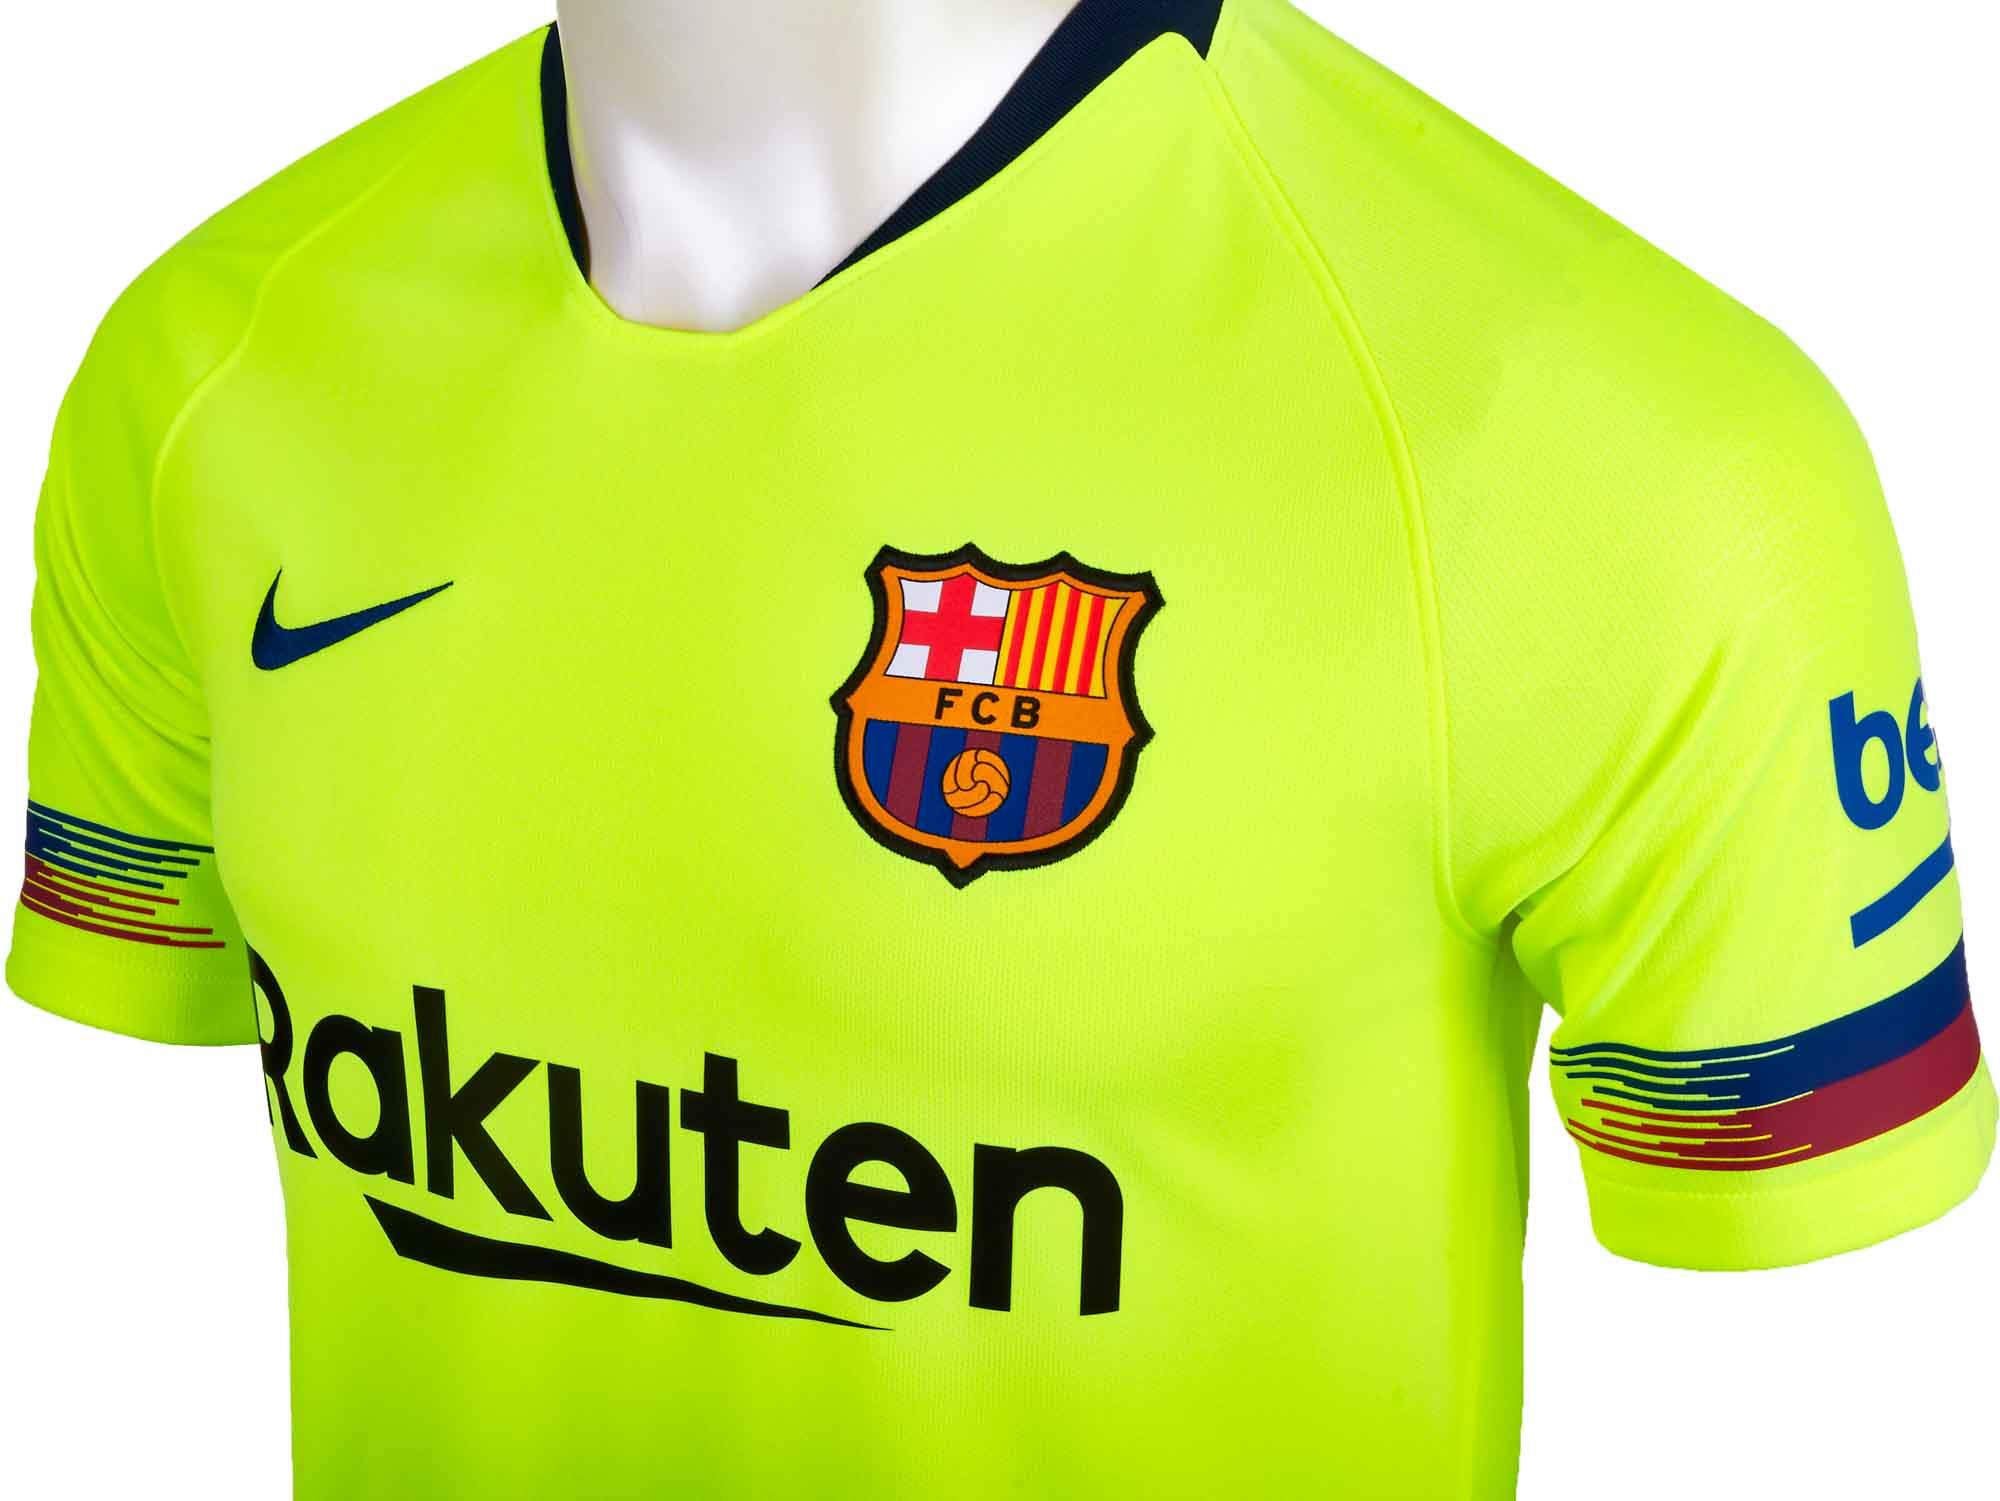 factory price c5f04 715b4 2018/19 Nike Lionel Messi Barcelona Away Jersey - SoccerPro